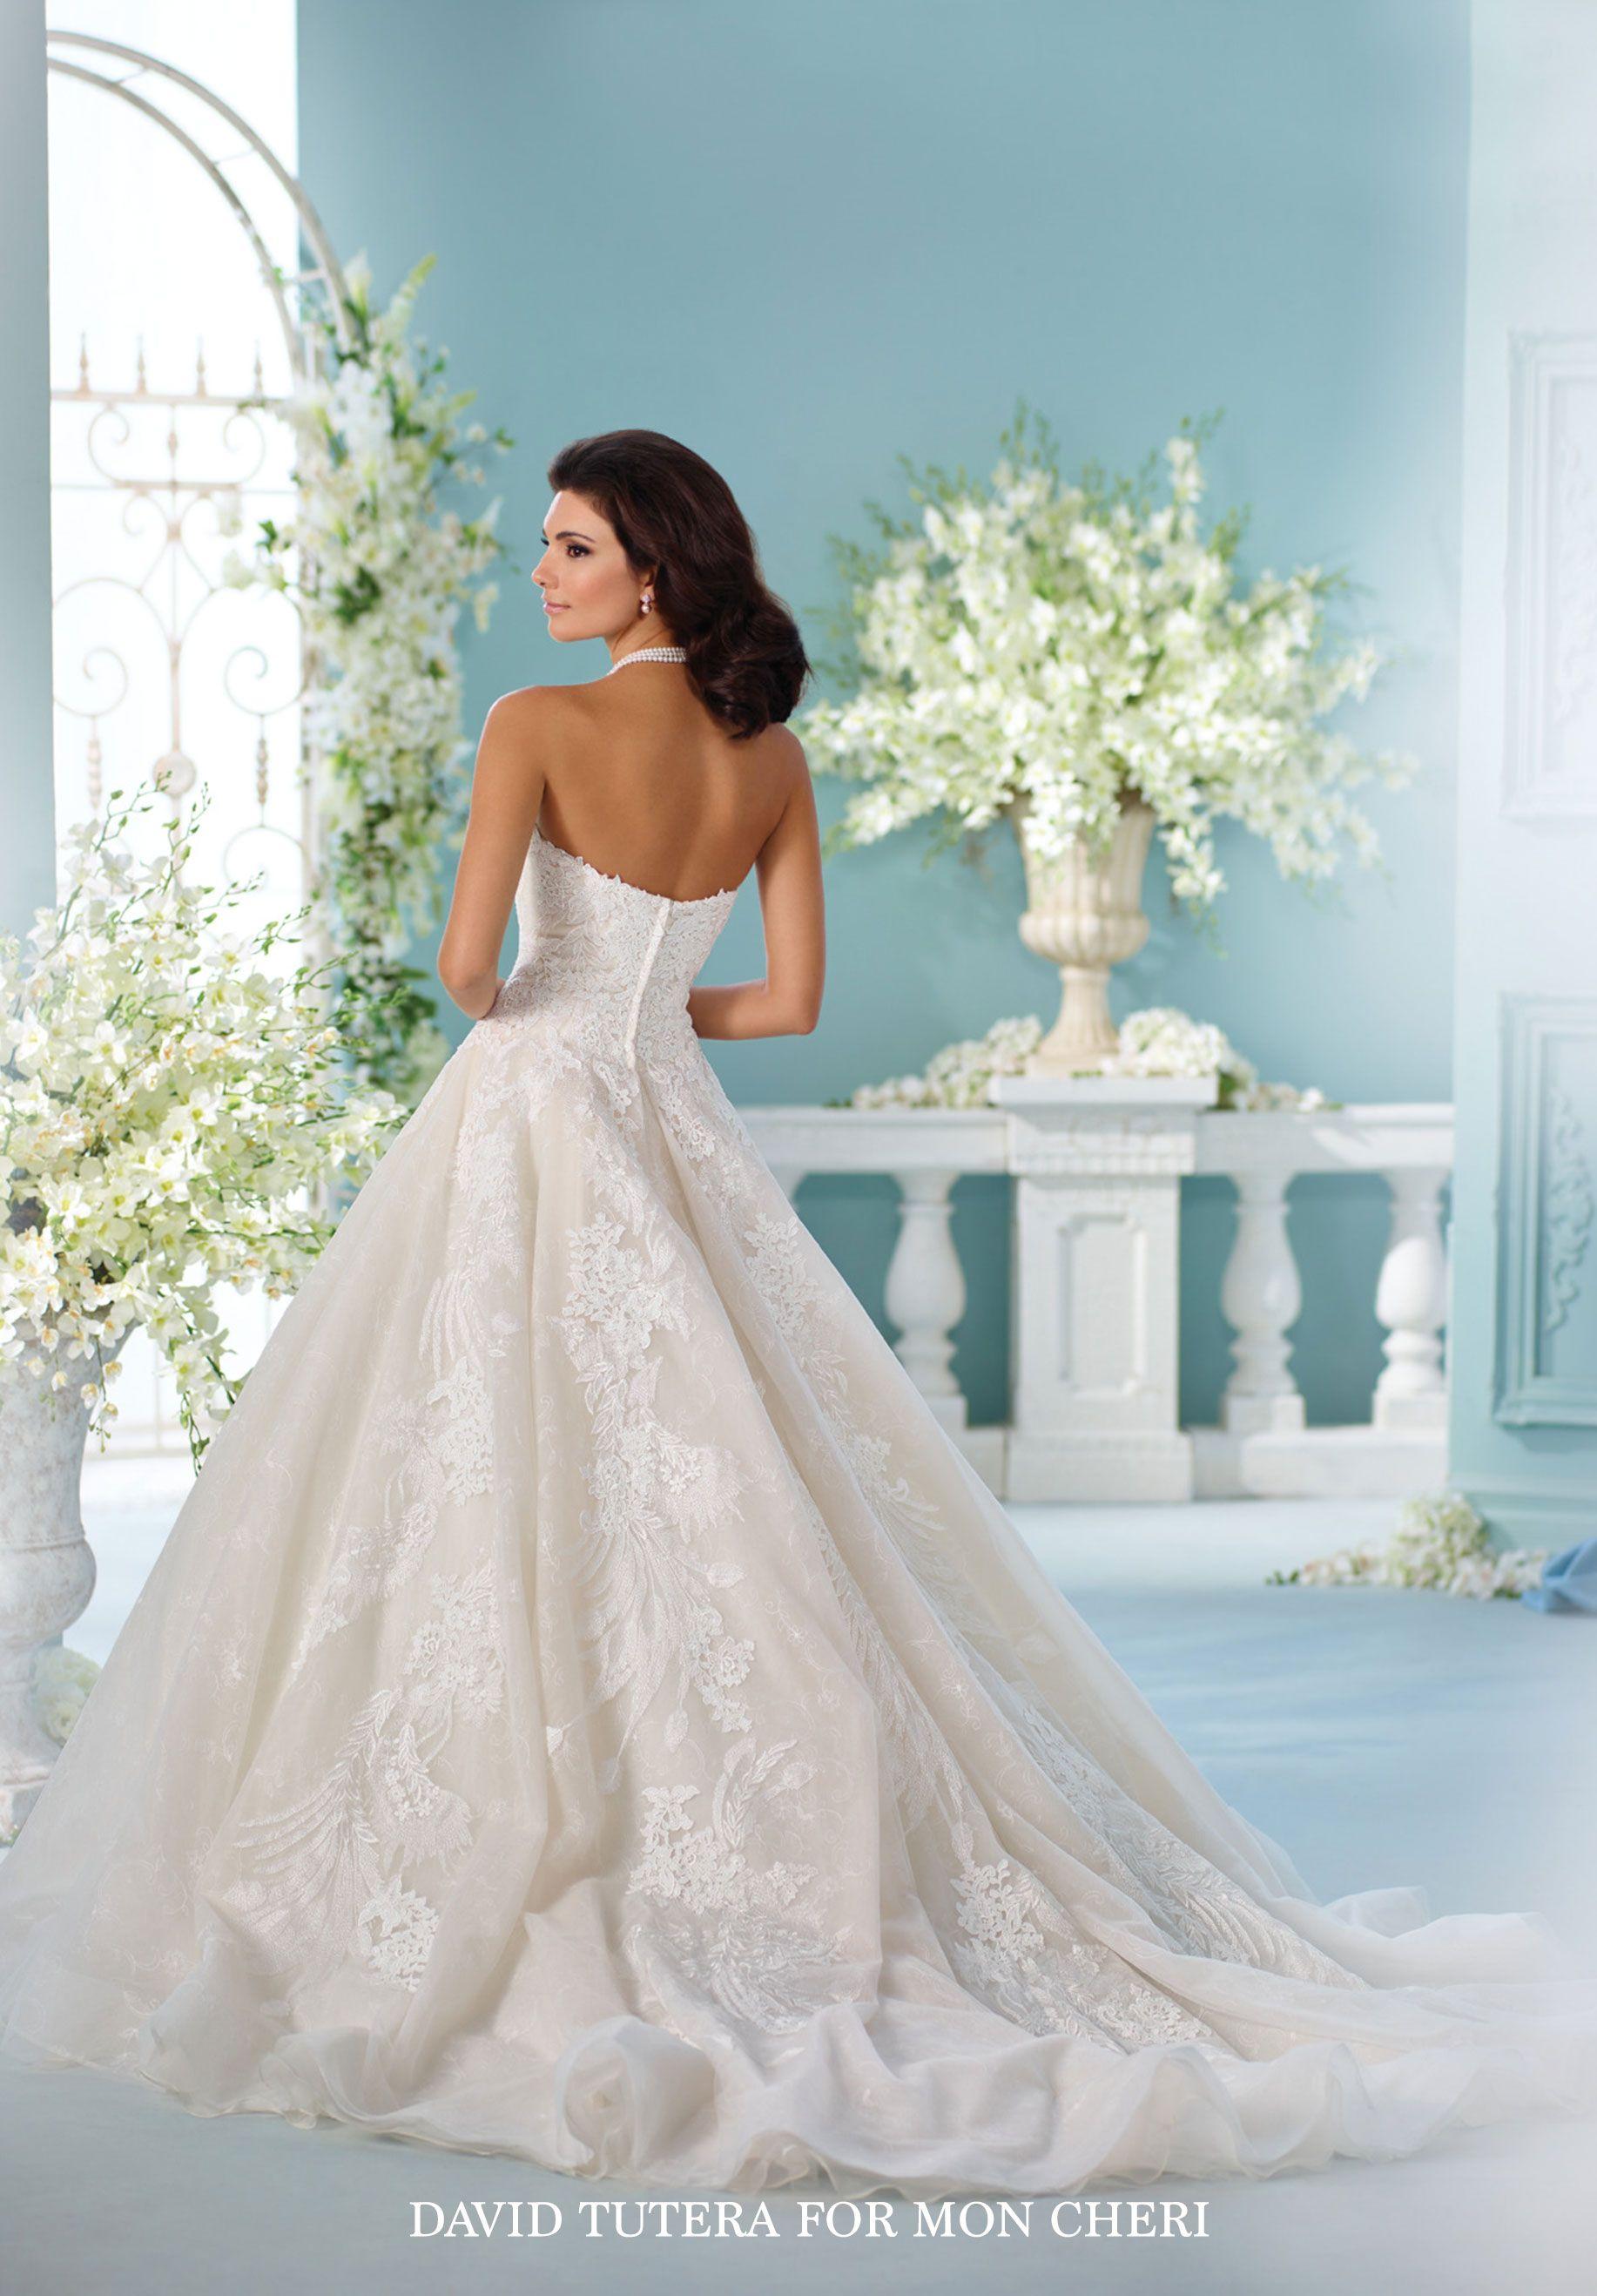 dt-216255 | The Wedding Gown | Pinterest | Weddings